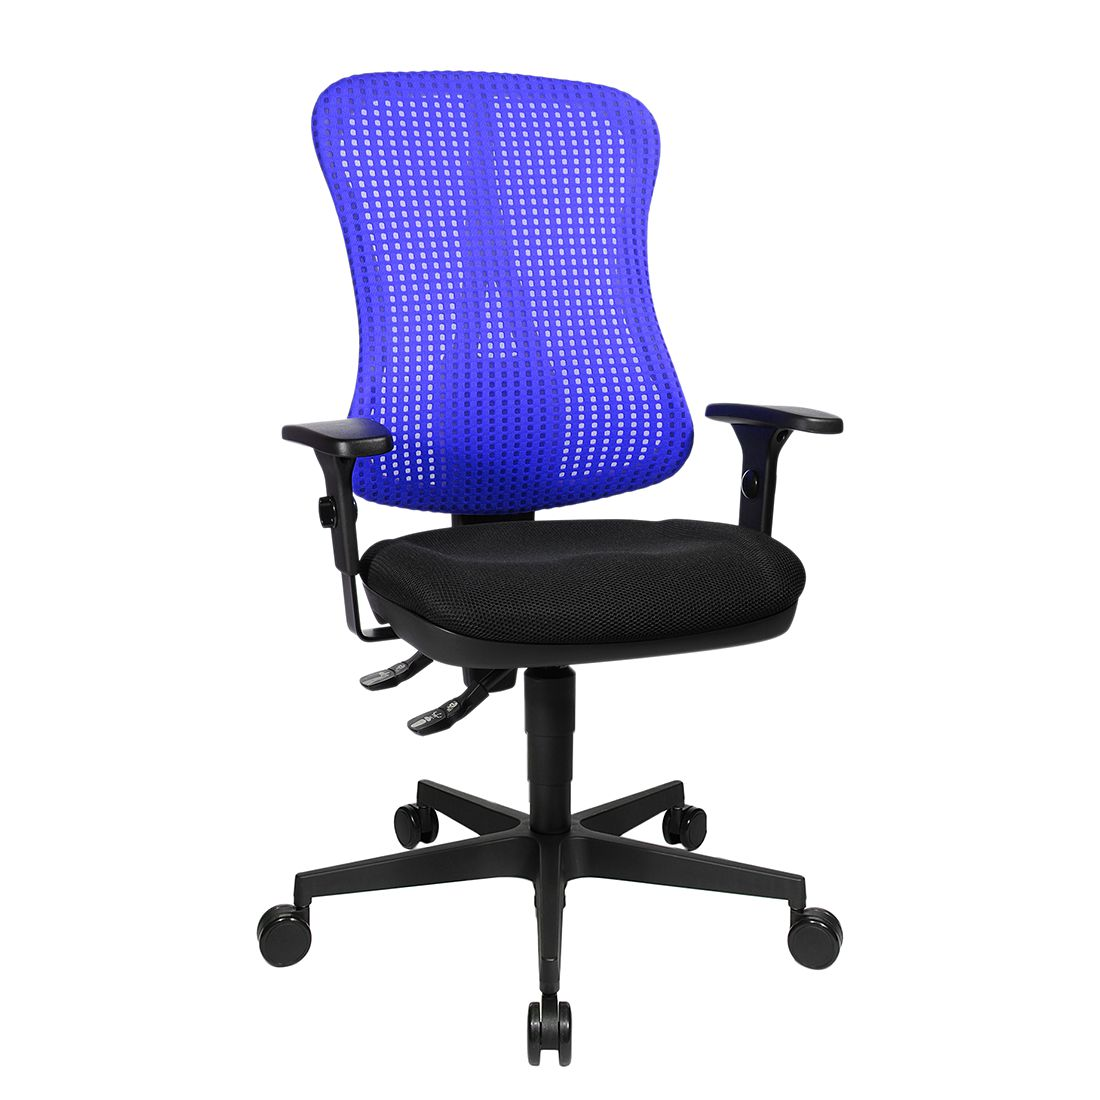 home24 Buerodrehstuhl Head Point   Büro > Bürostühle und Sessel    Blau   Topstar